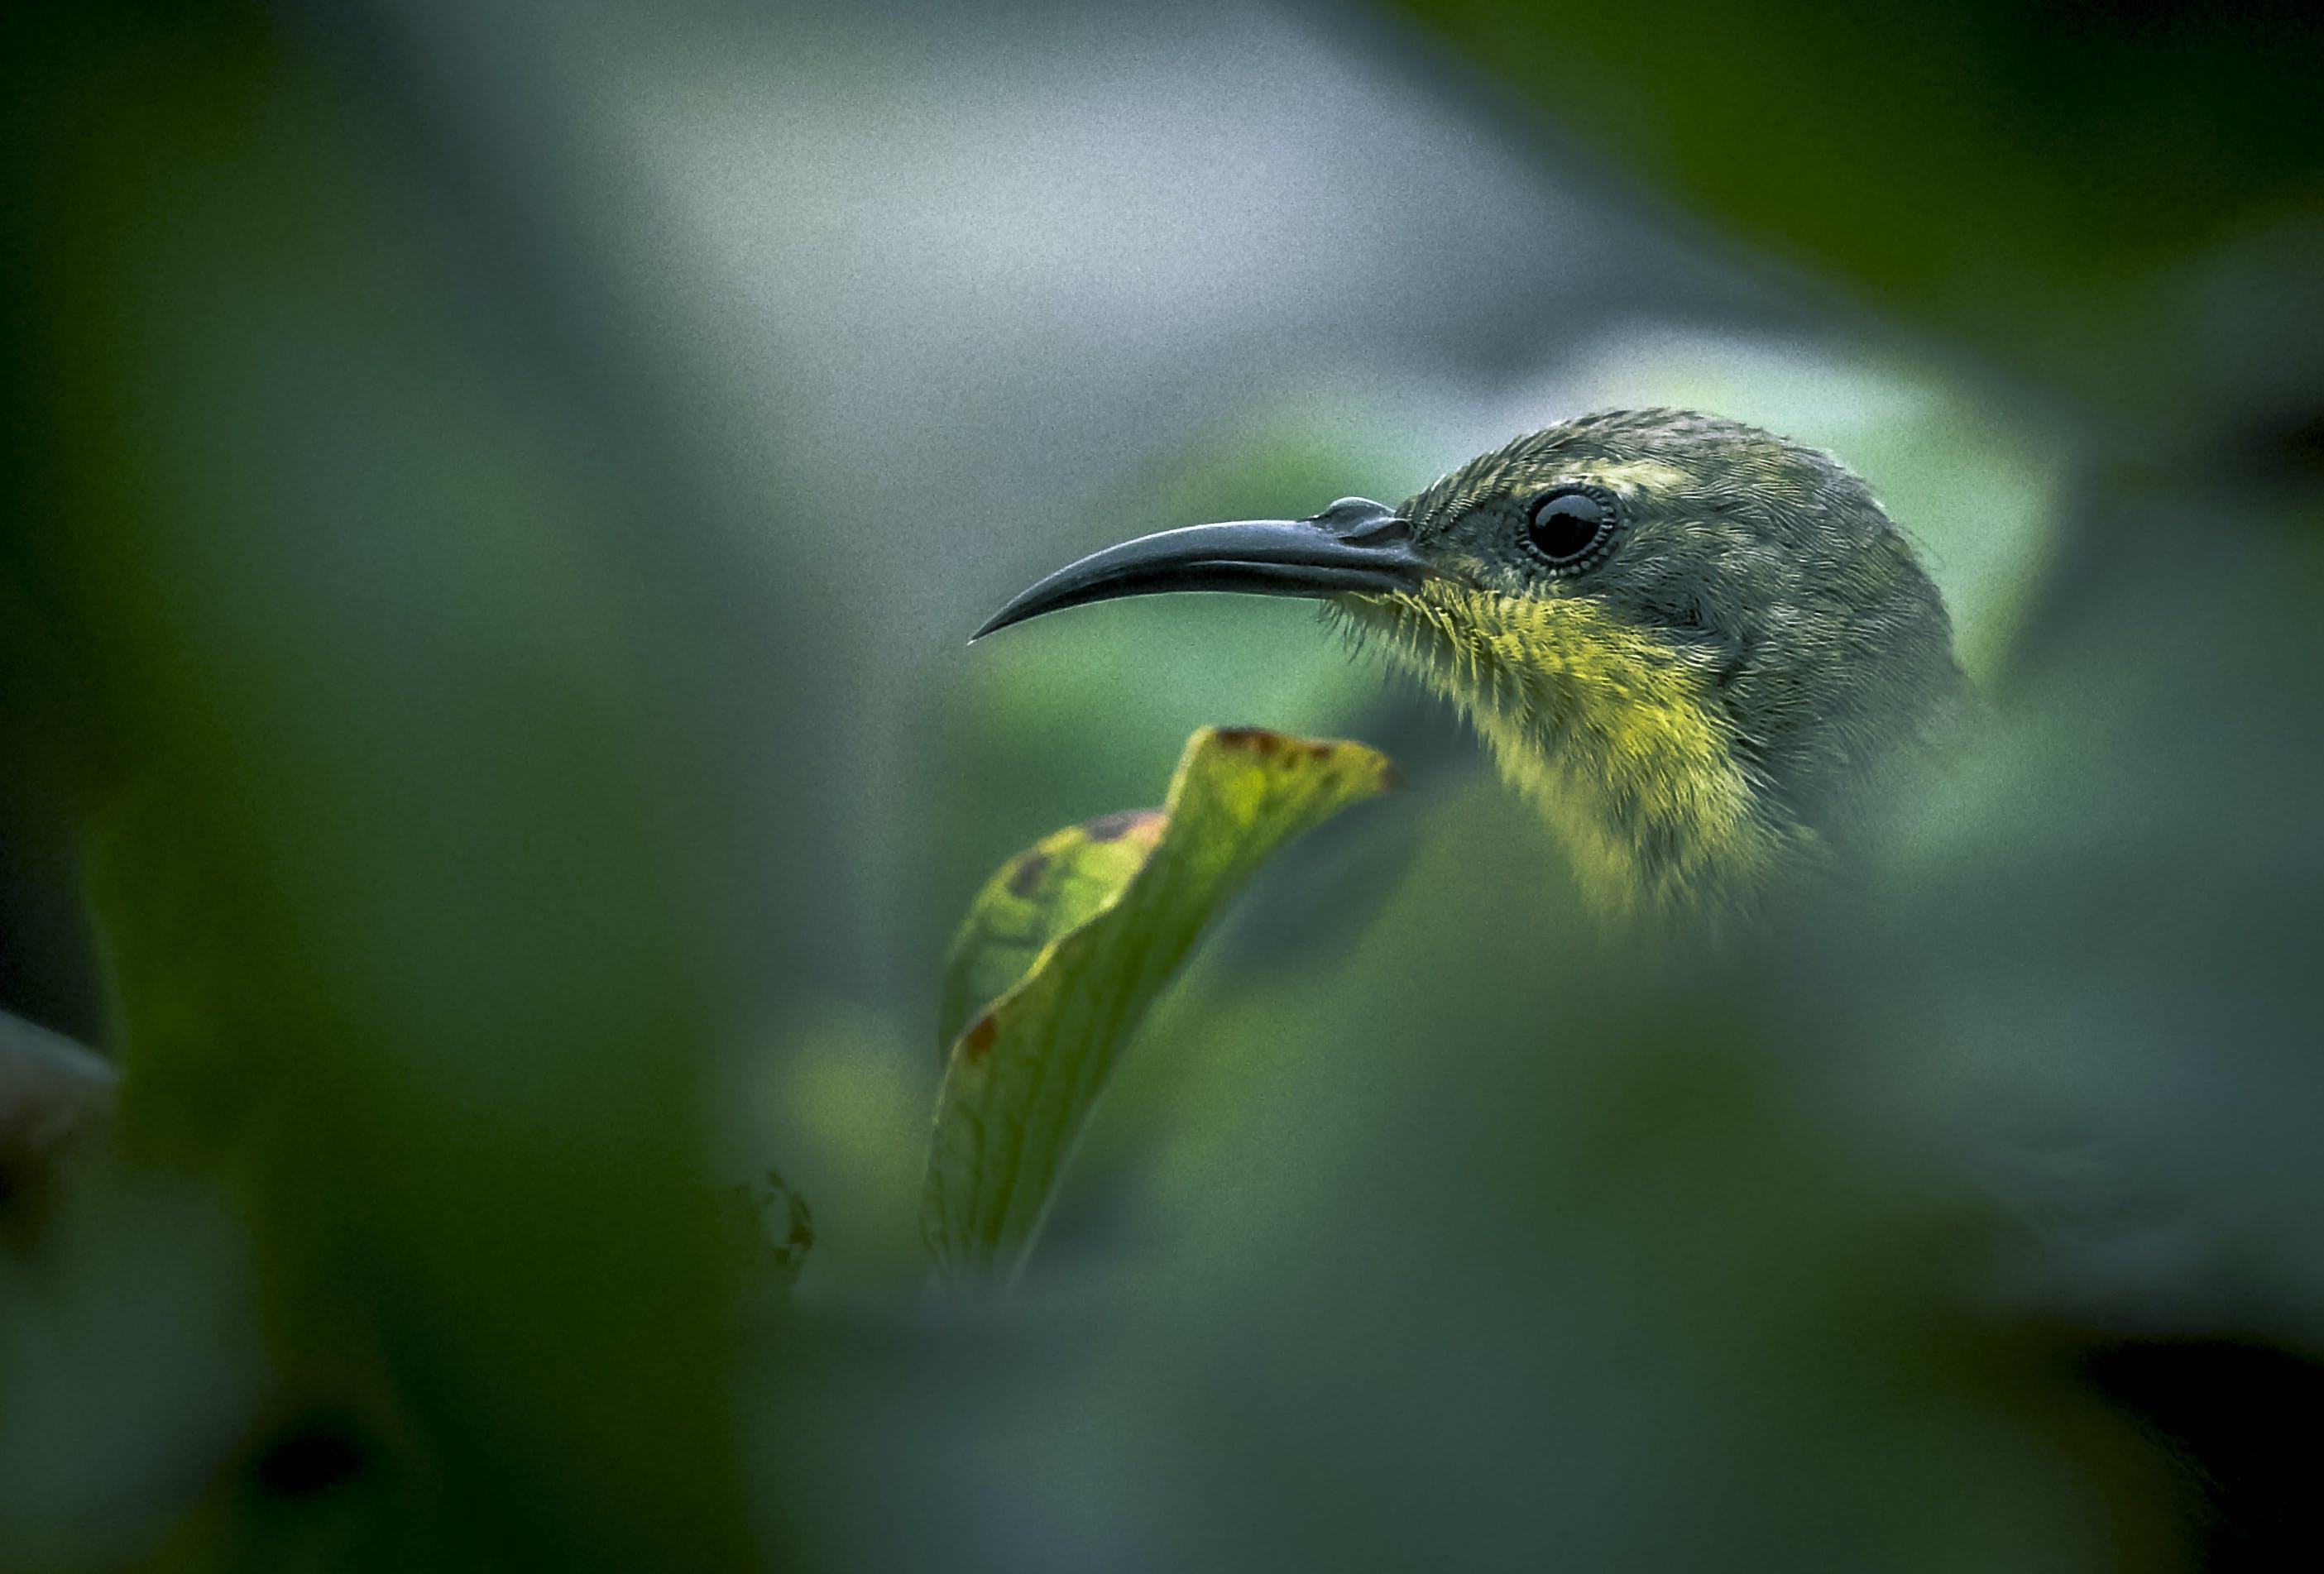 Gratis lagerfoto af sunbird